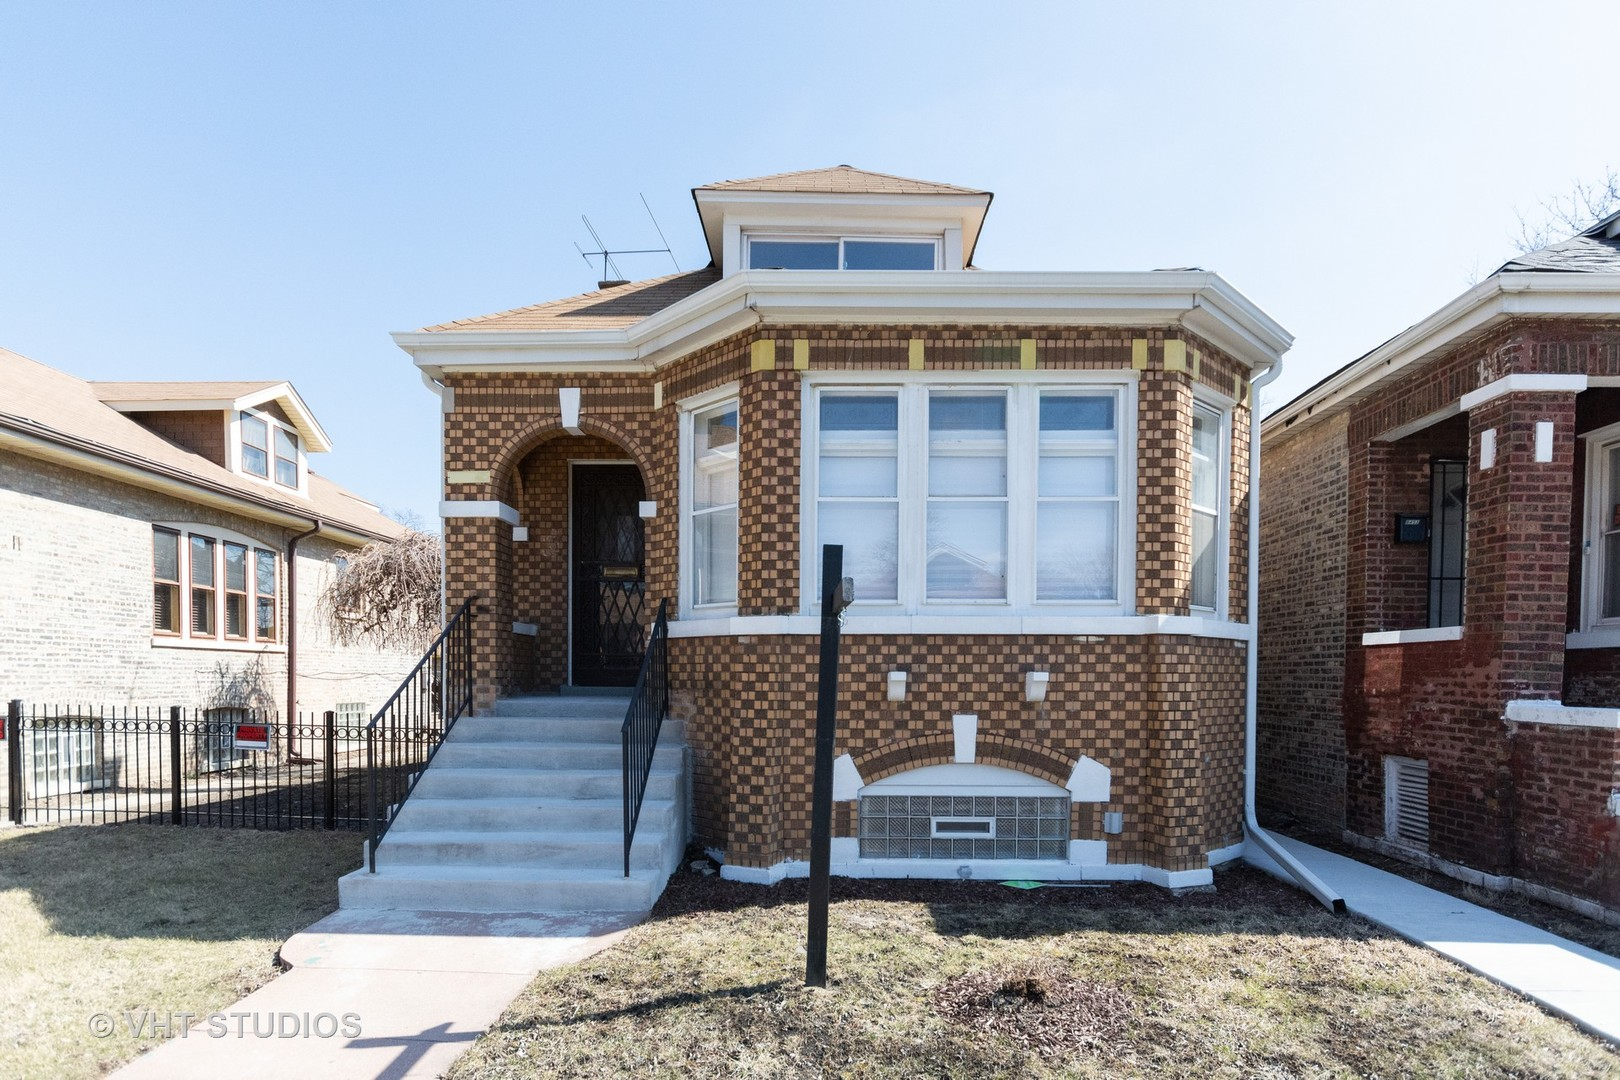 8451 South Aberdeen Street Chicago, IL 60620